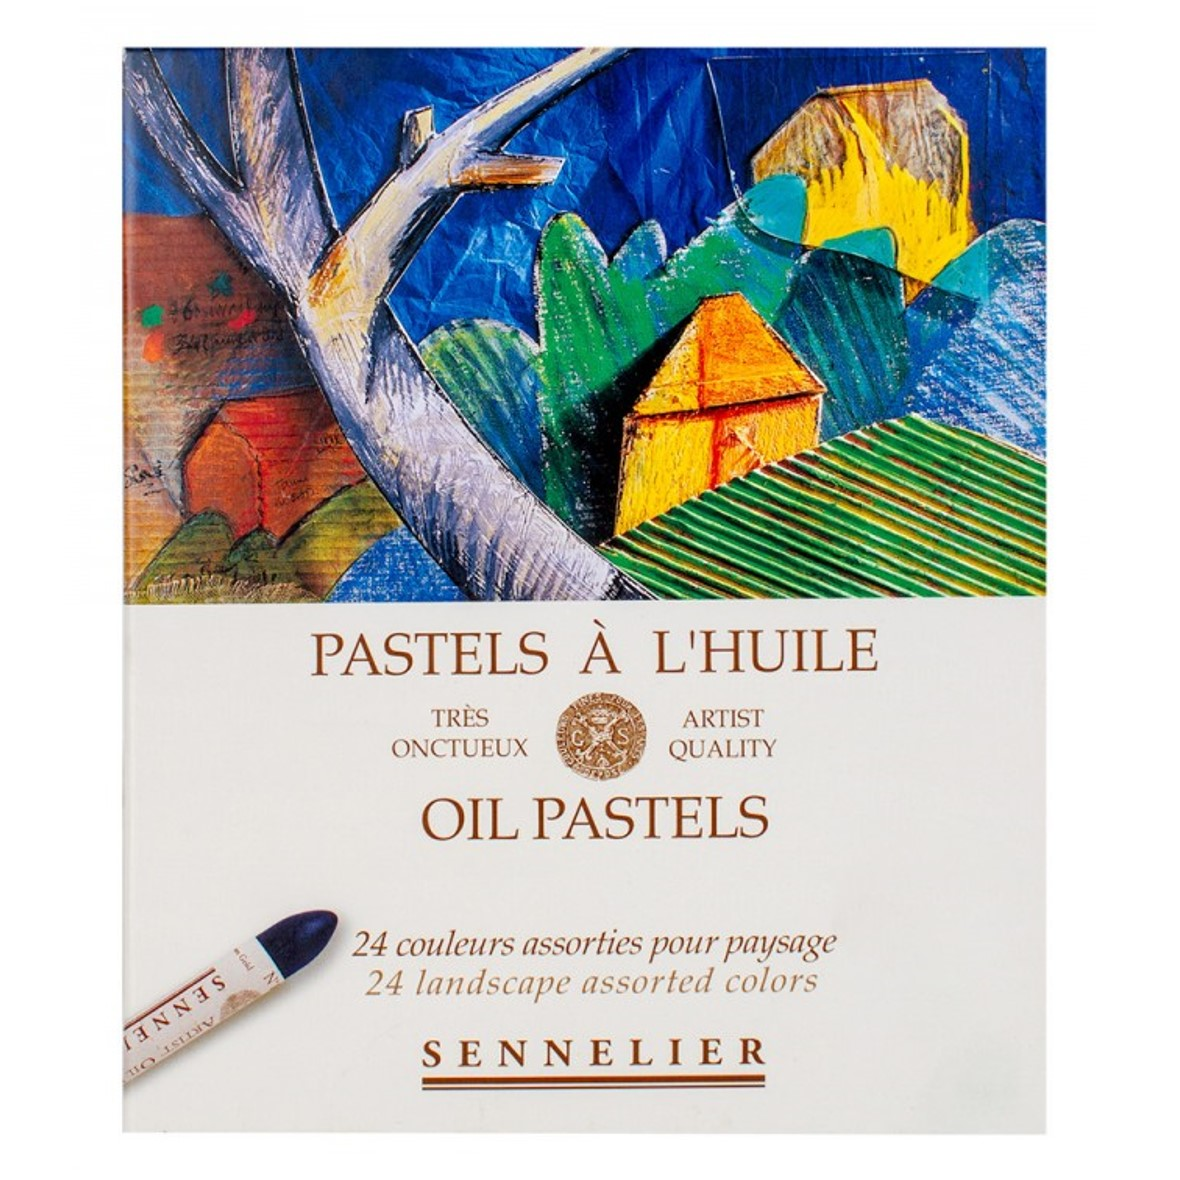 Sennelier Oil Pastel Set of 24 Landscape